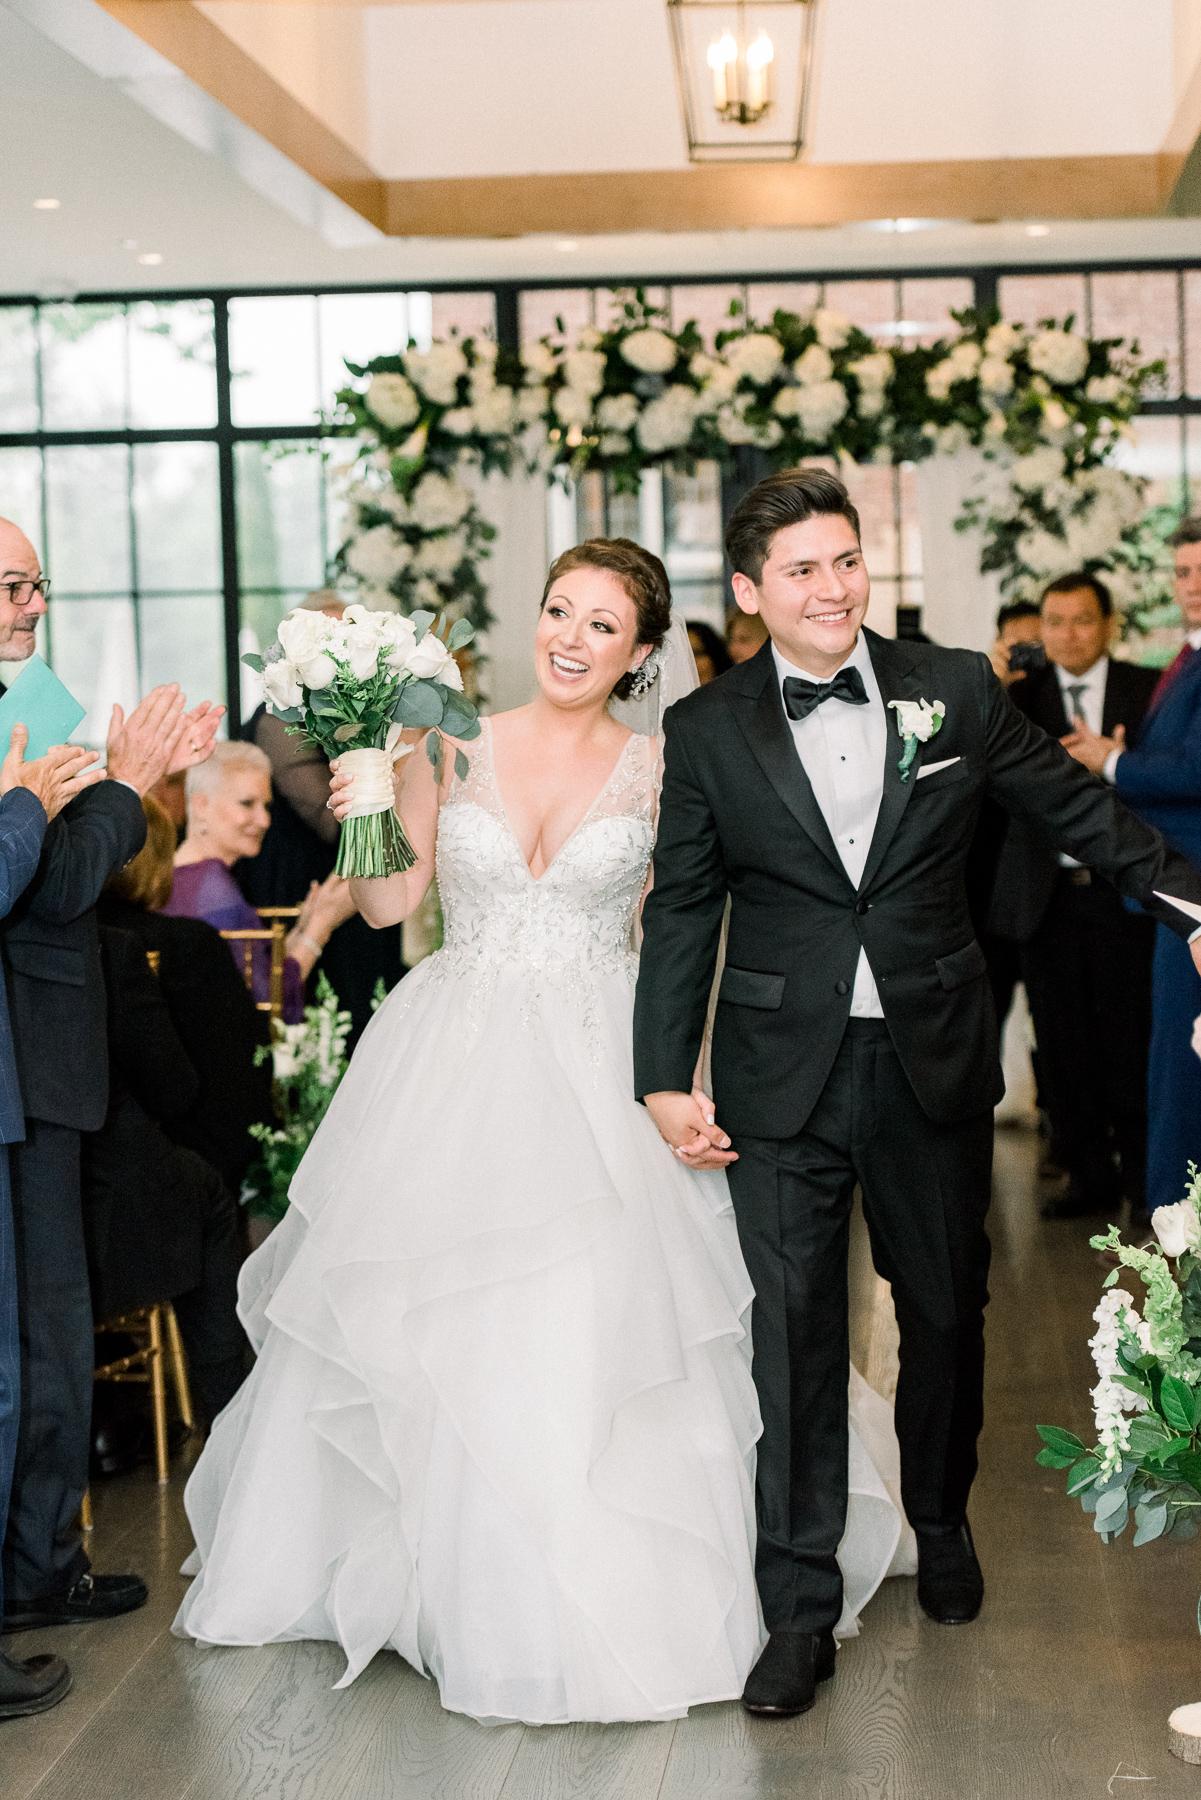 Just Married at Indoor Ceremony at Natirar Mansion